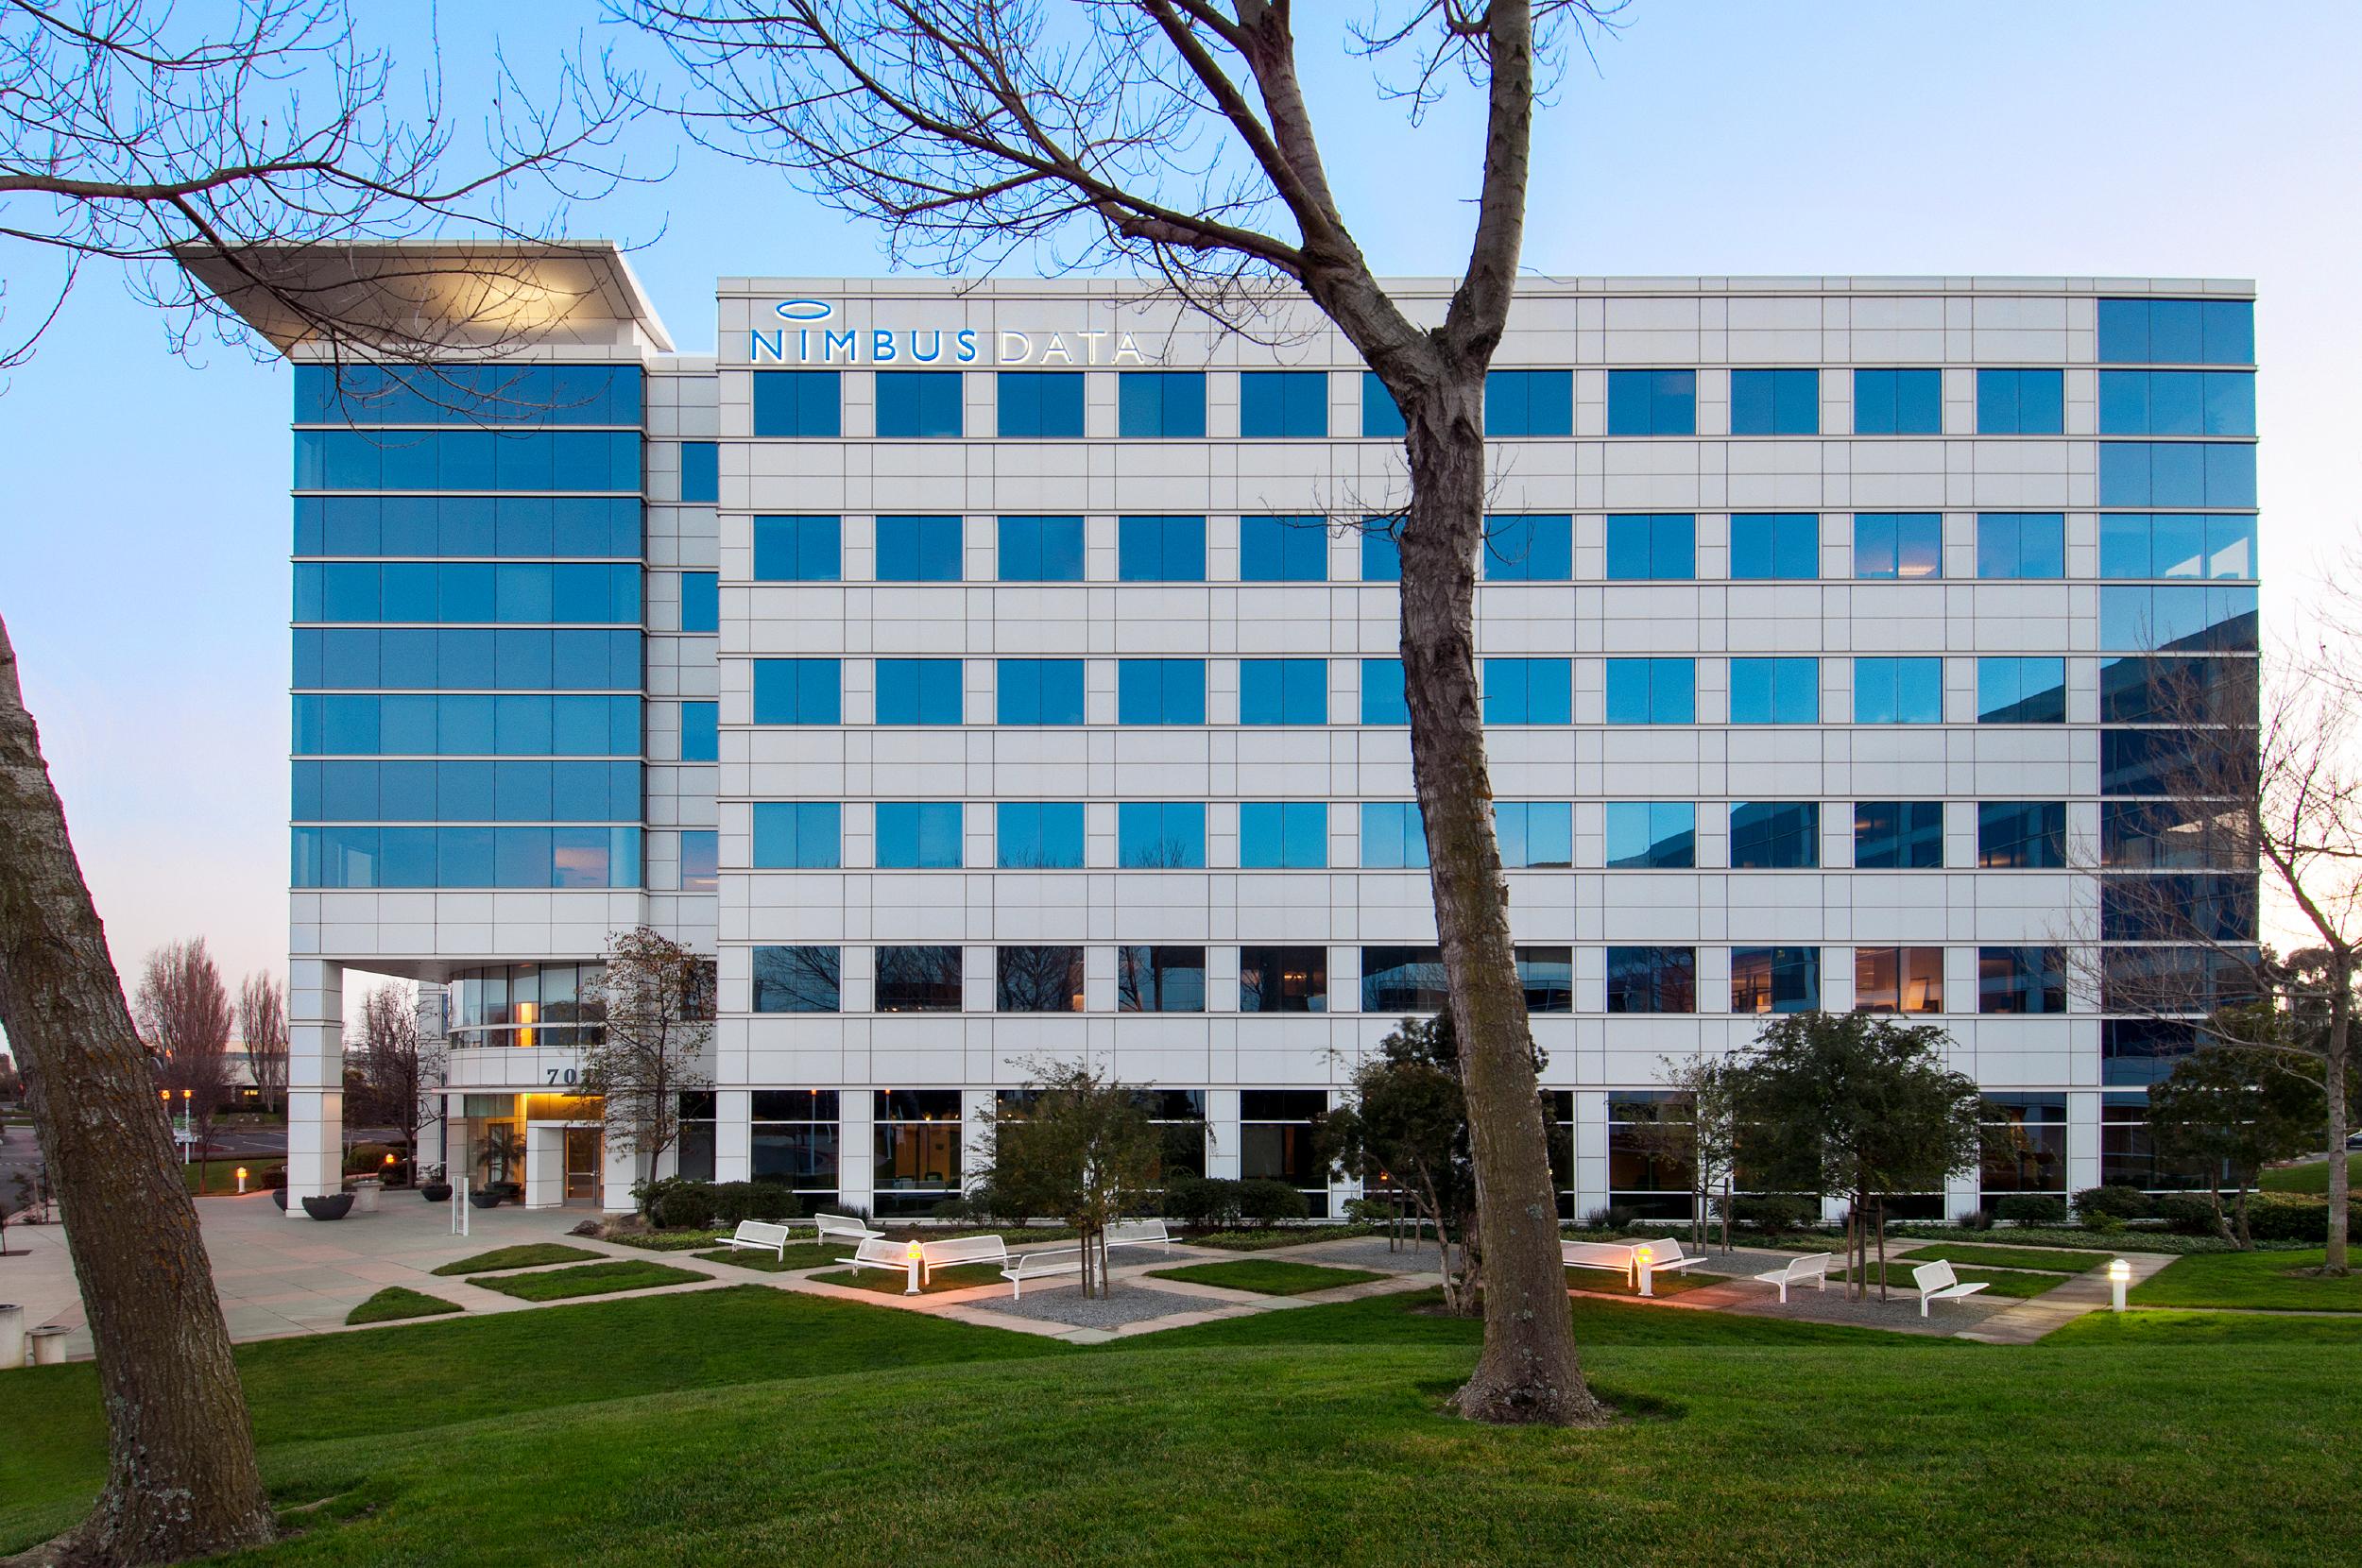 Nimbus Data Commercial Building